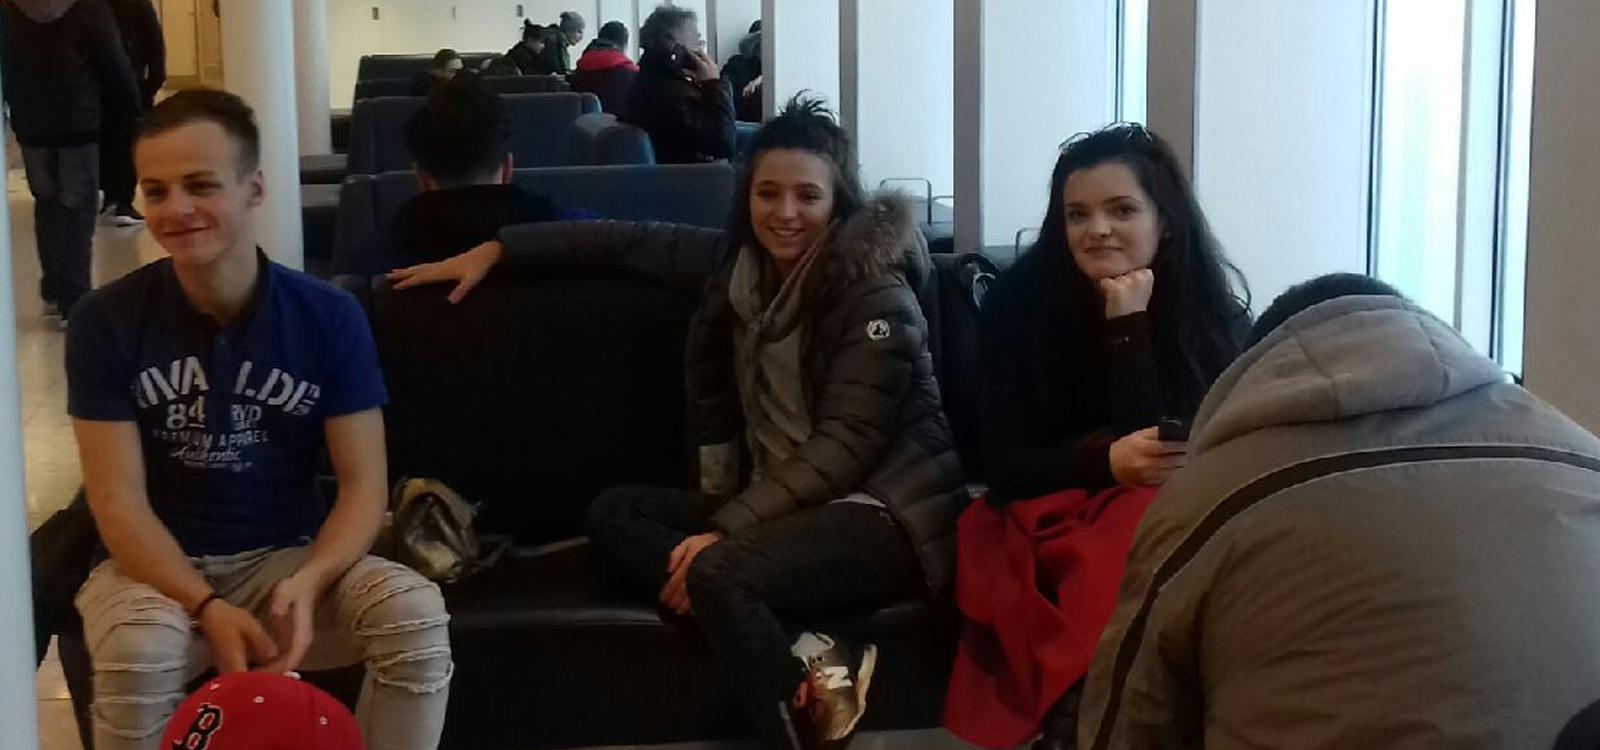 voyage-londres-lycee-2018-carrousselle